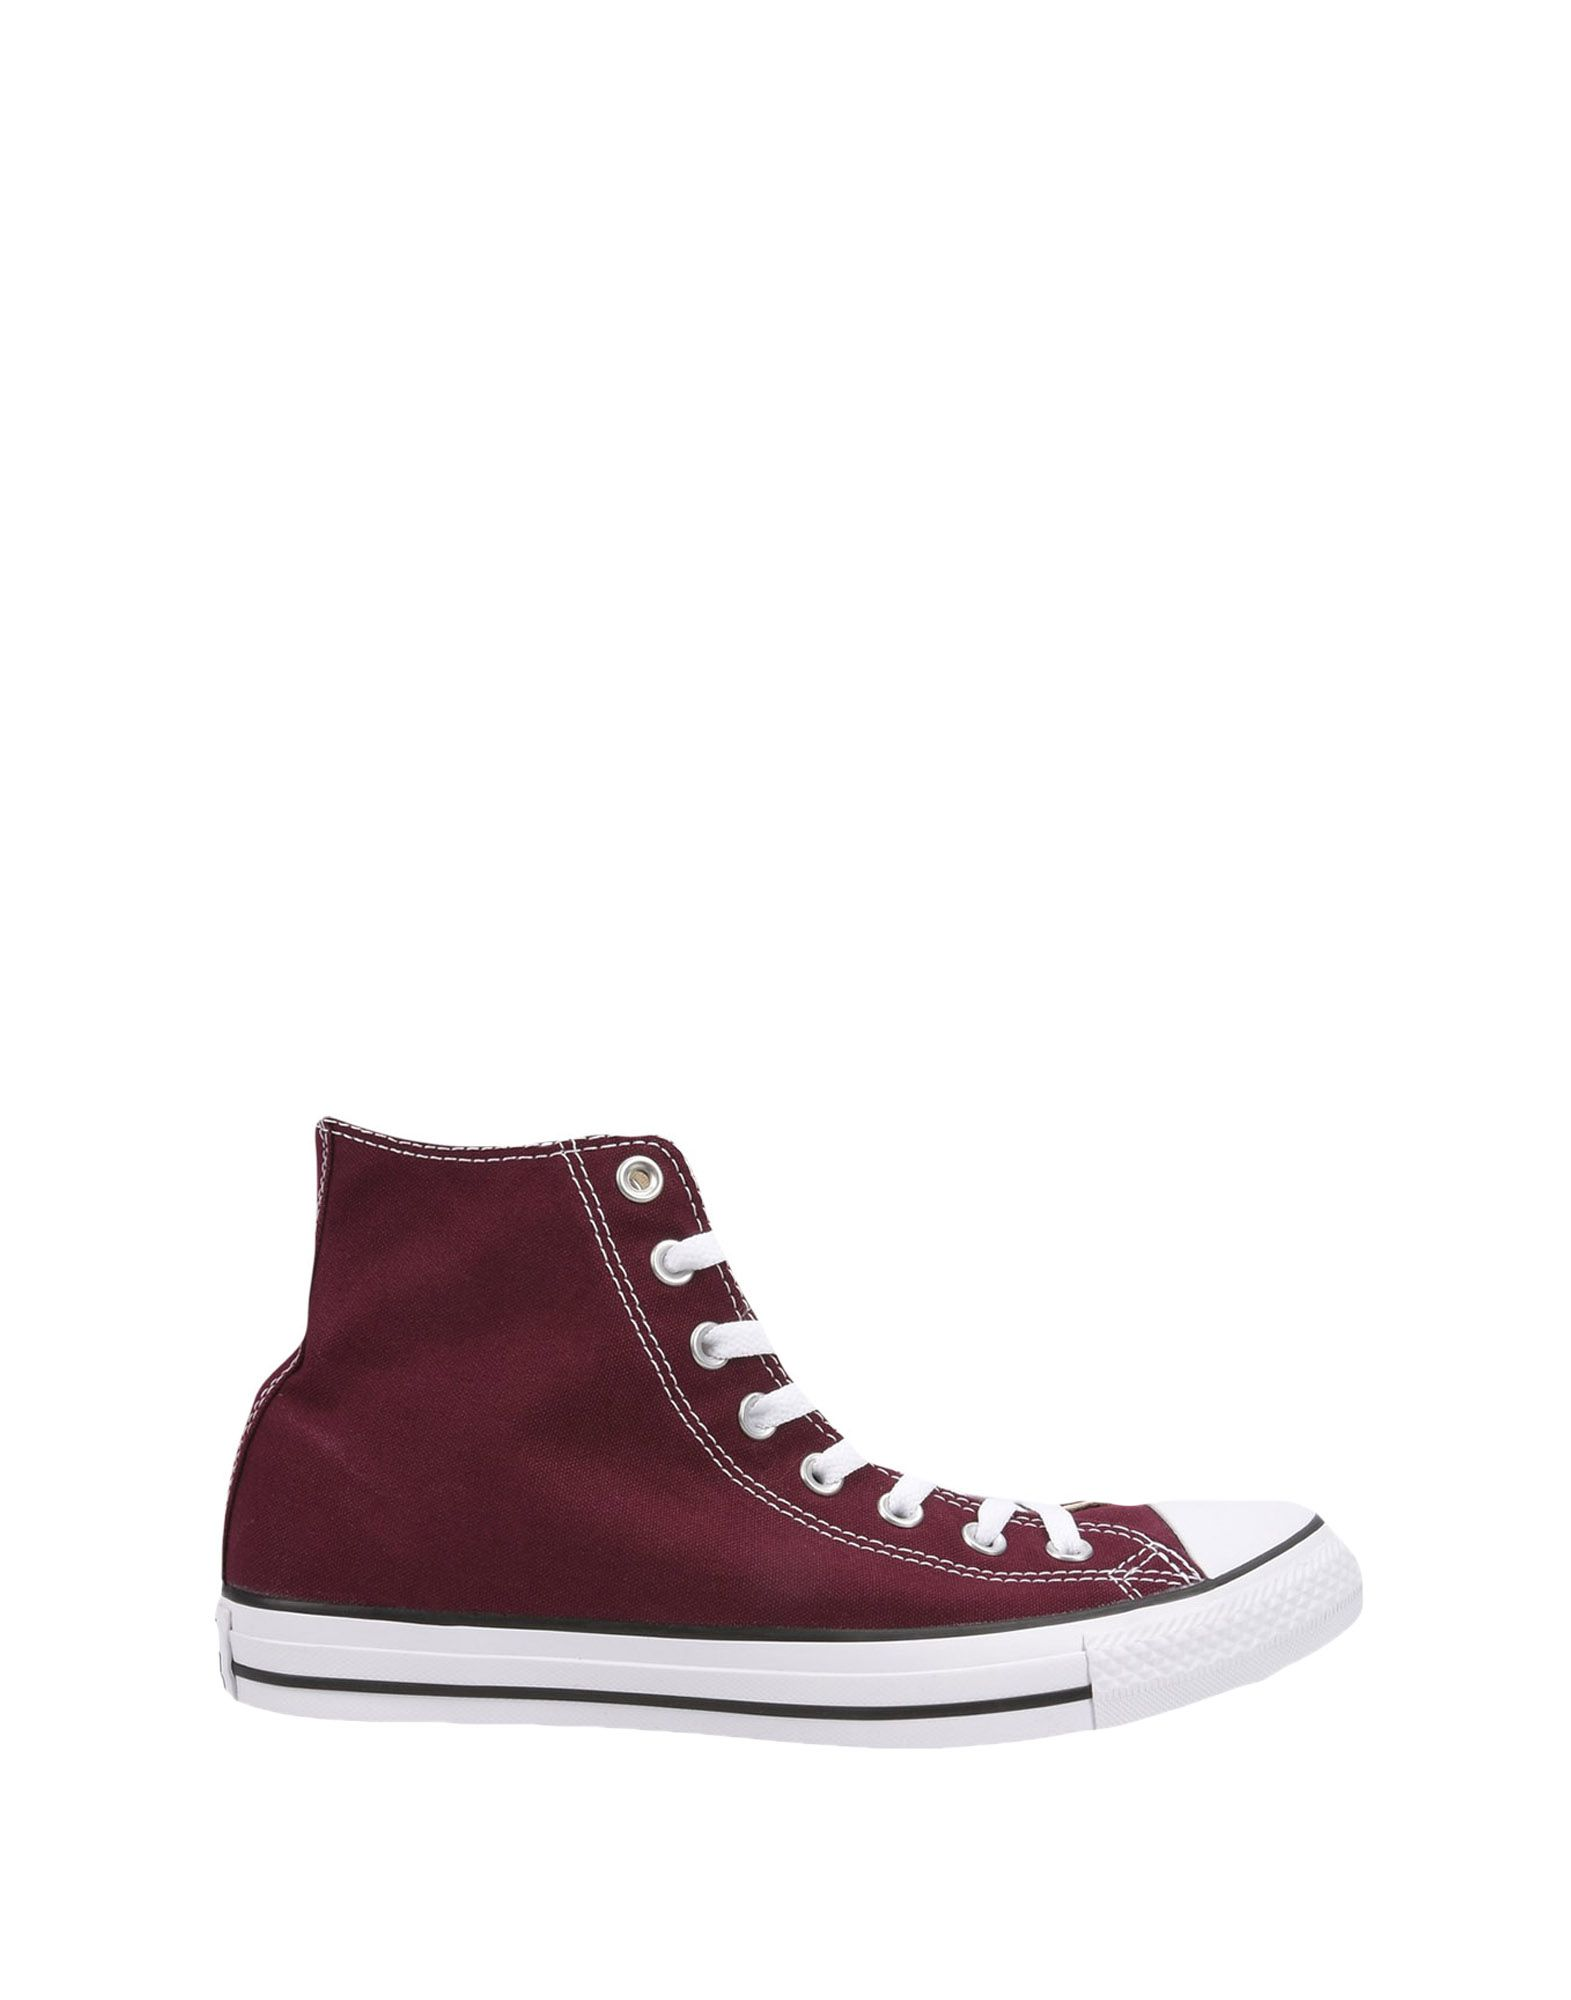 Converse All Star Ct As As Ct Hi Canvas Seasonal  11335827XT Gute Qualität beliebte Schuhe cf7d5f